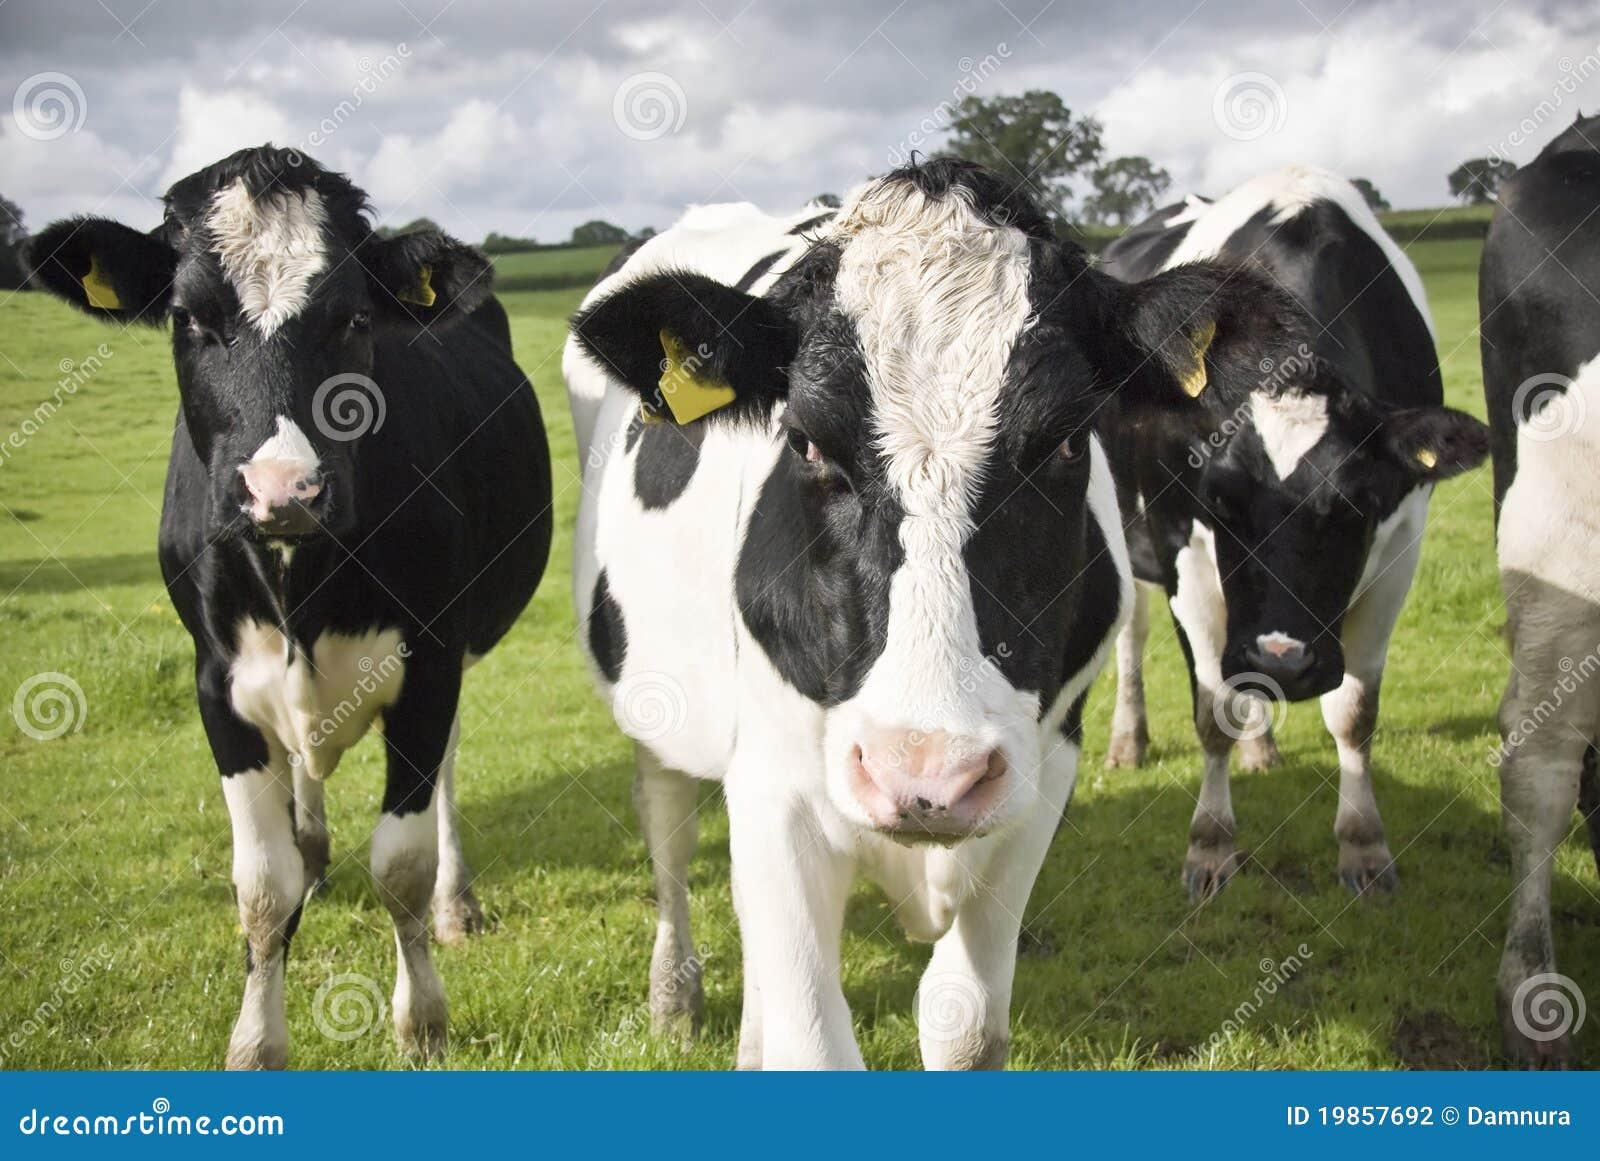 Black-and-white cows: description and characteristics 63